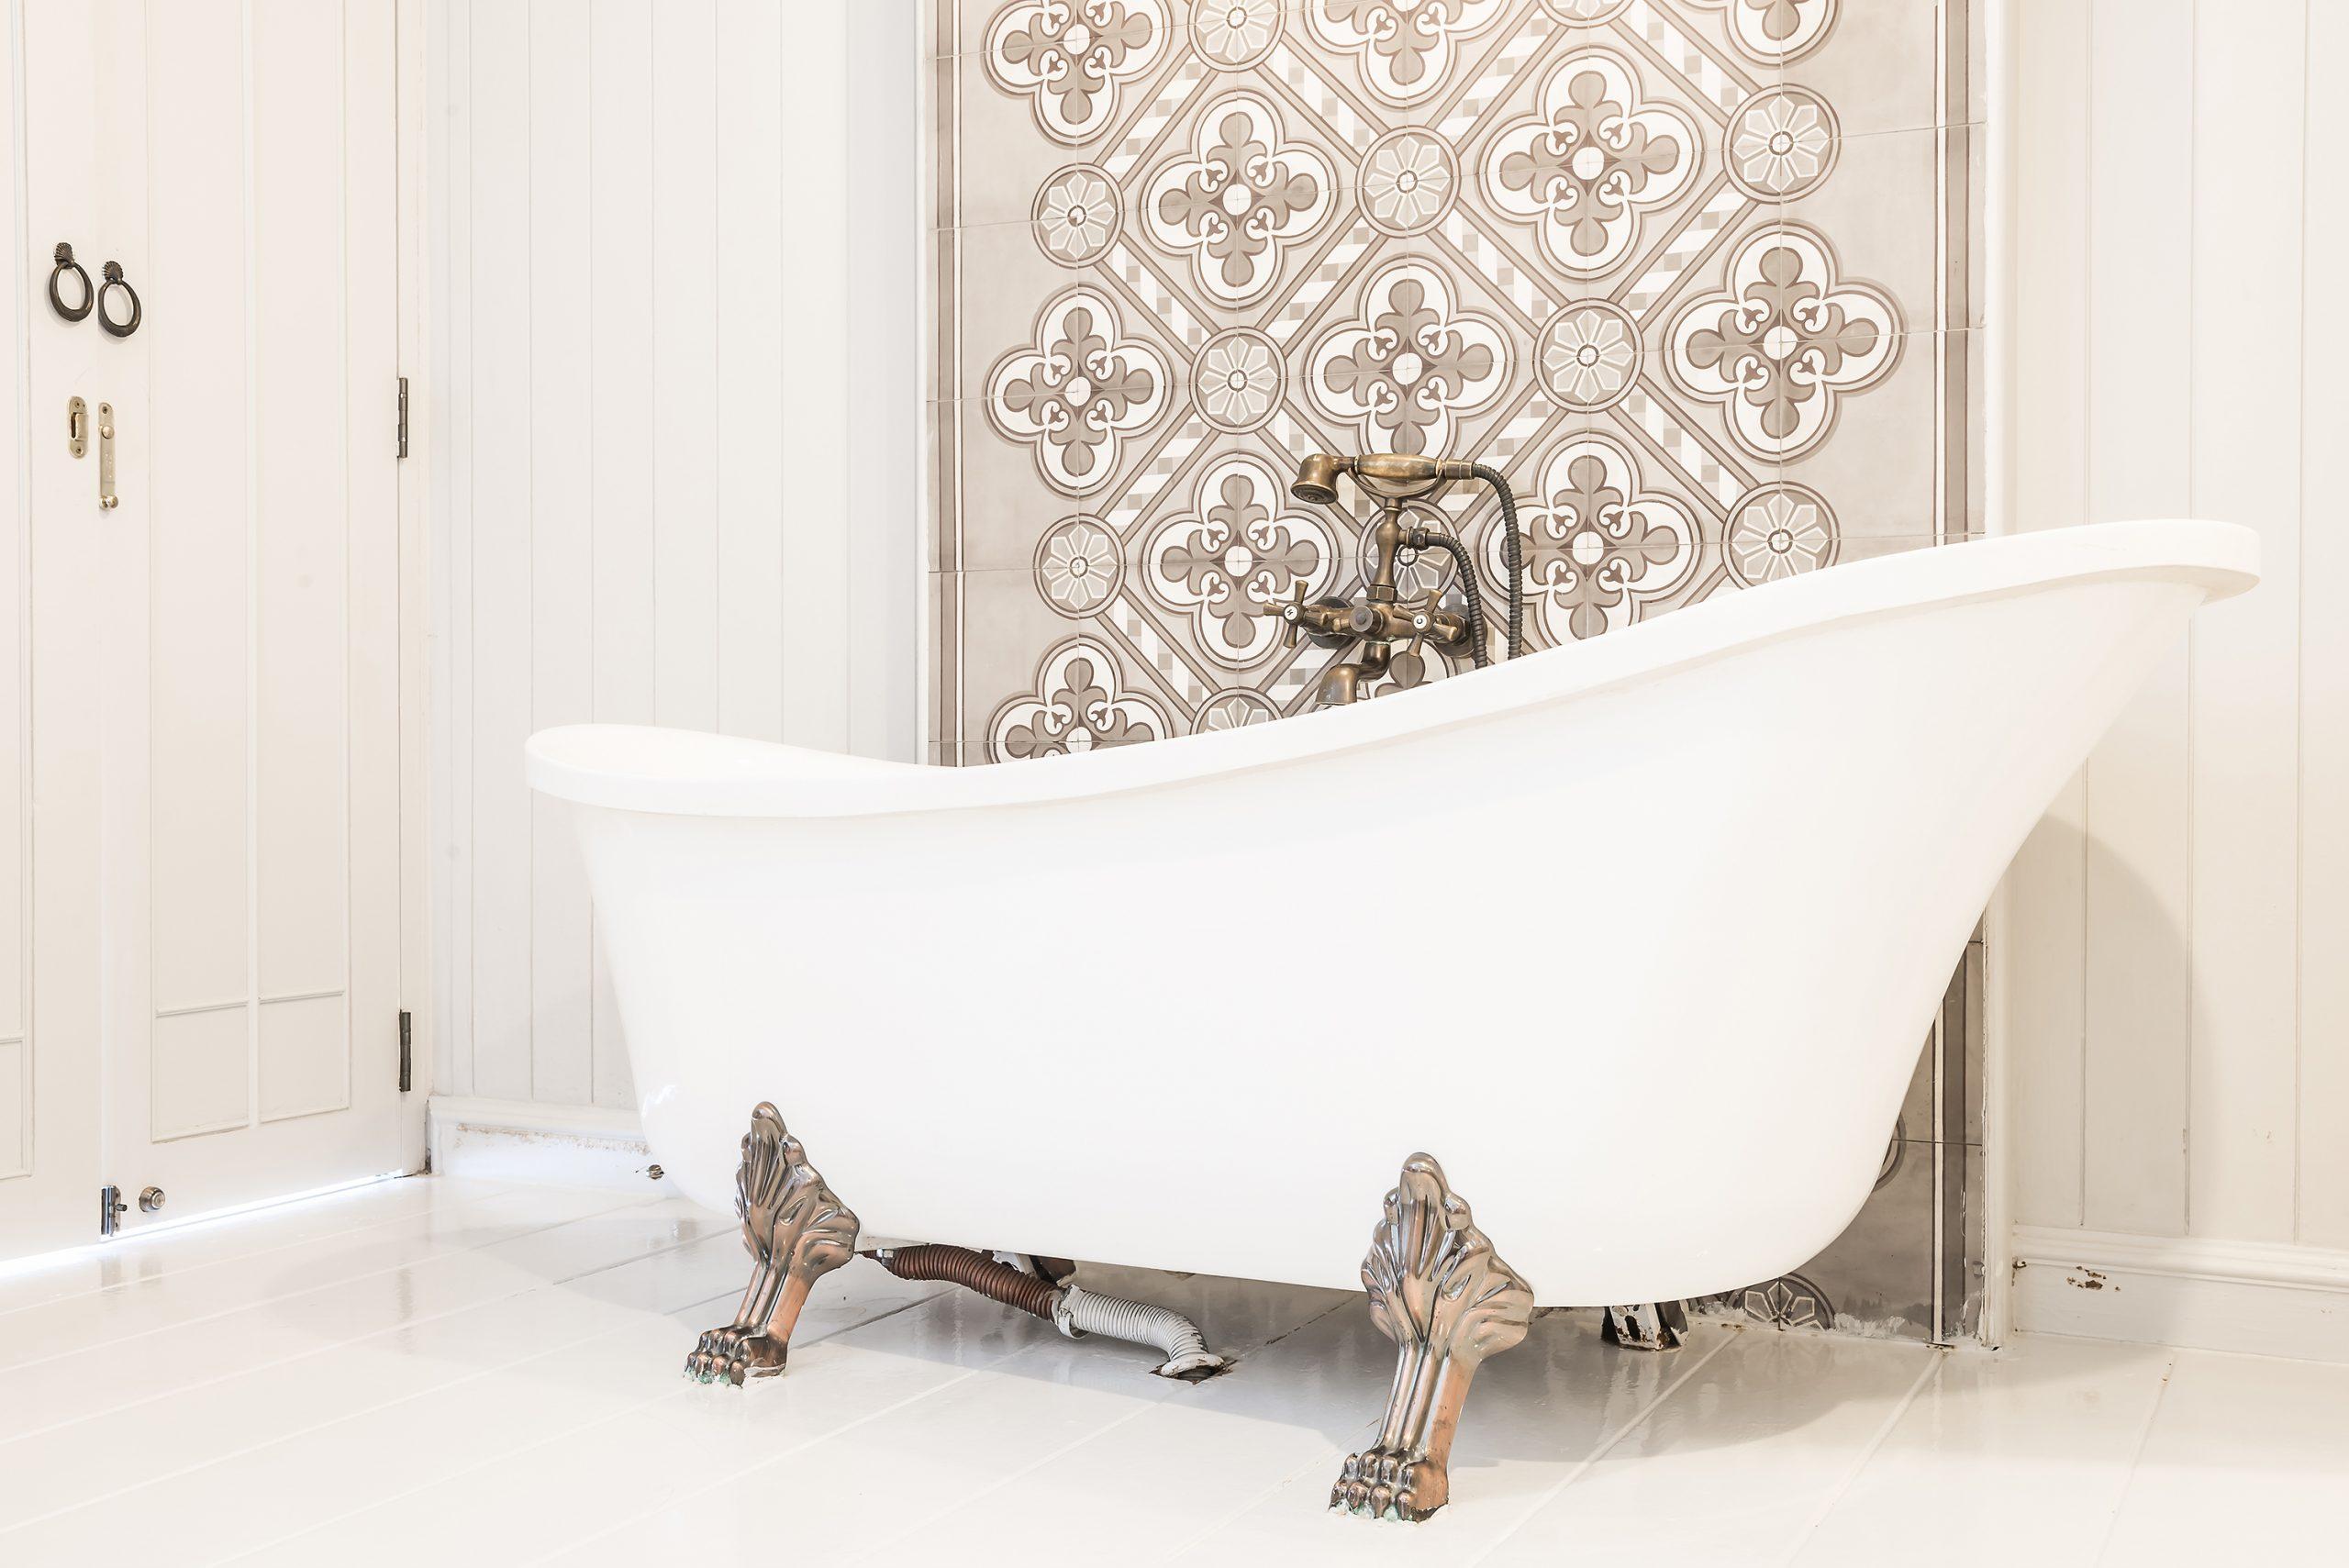 My Bathtub has Rust Spots